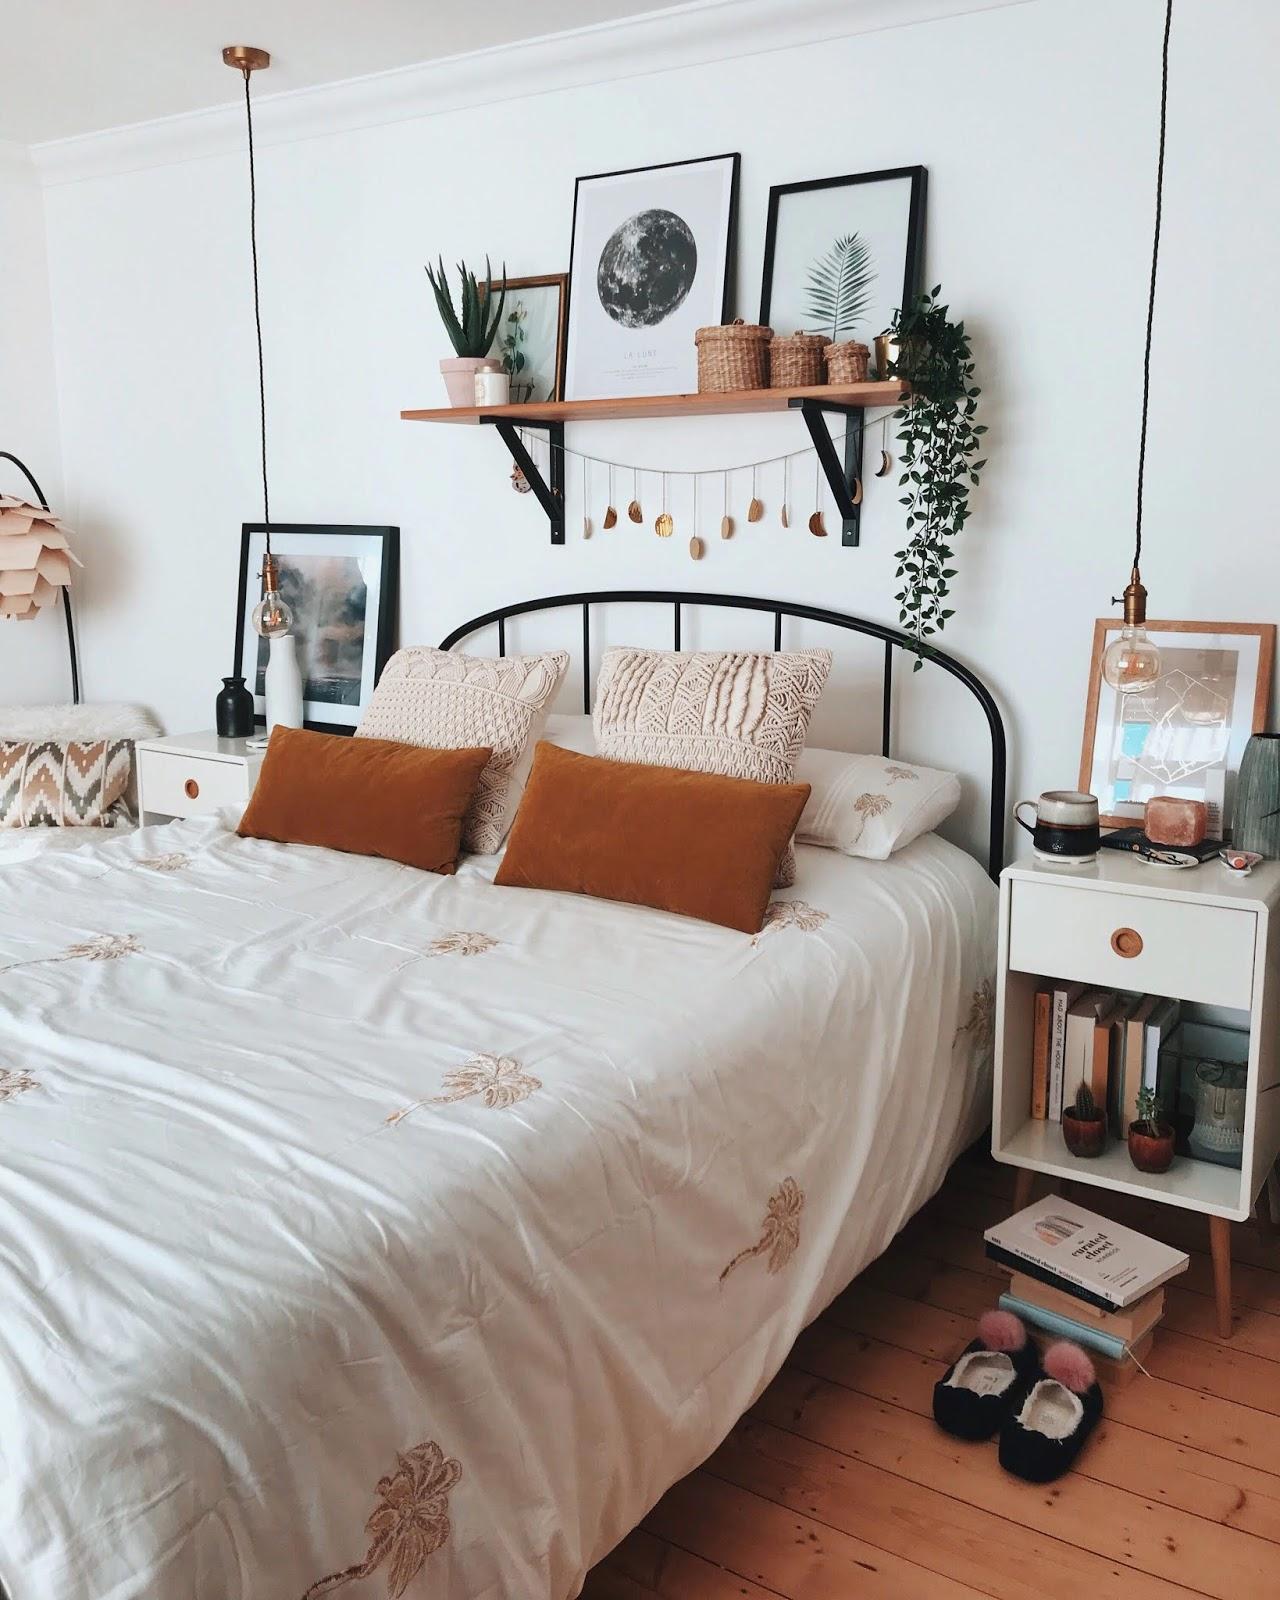 Cozy Bedroom Interior Design for You